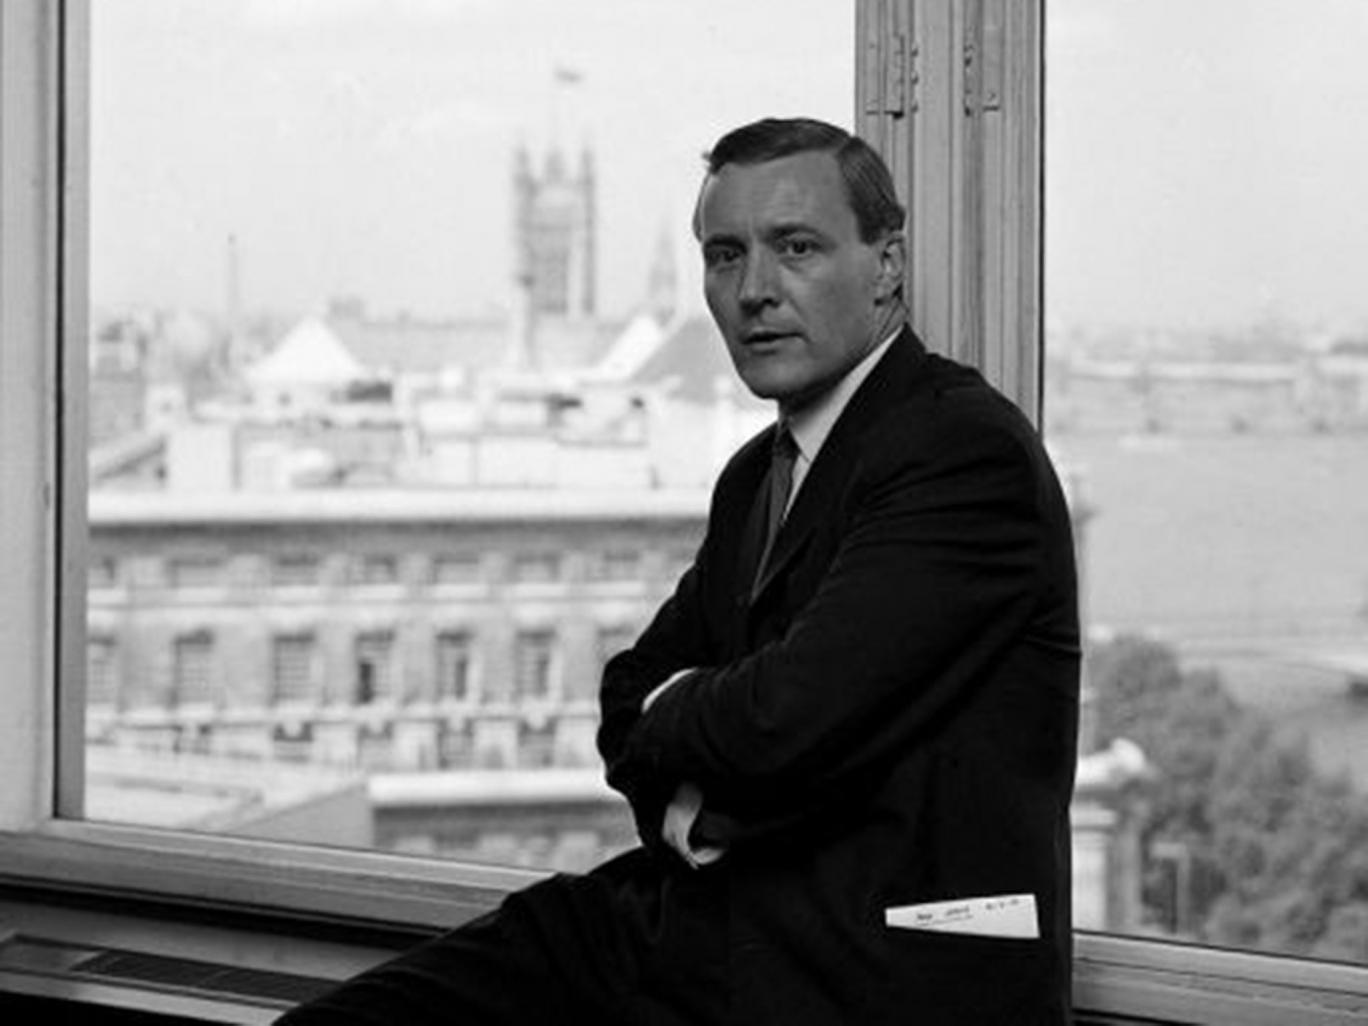 Tony Benn pictured in 1966